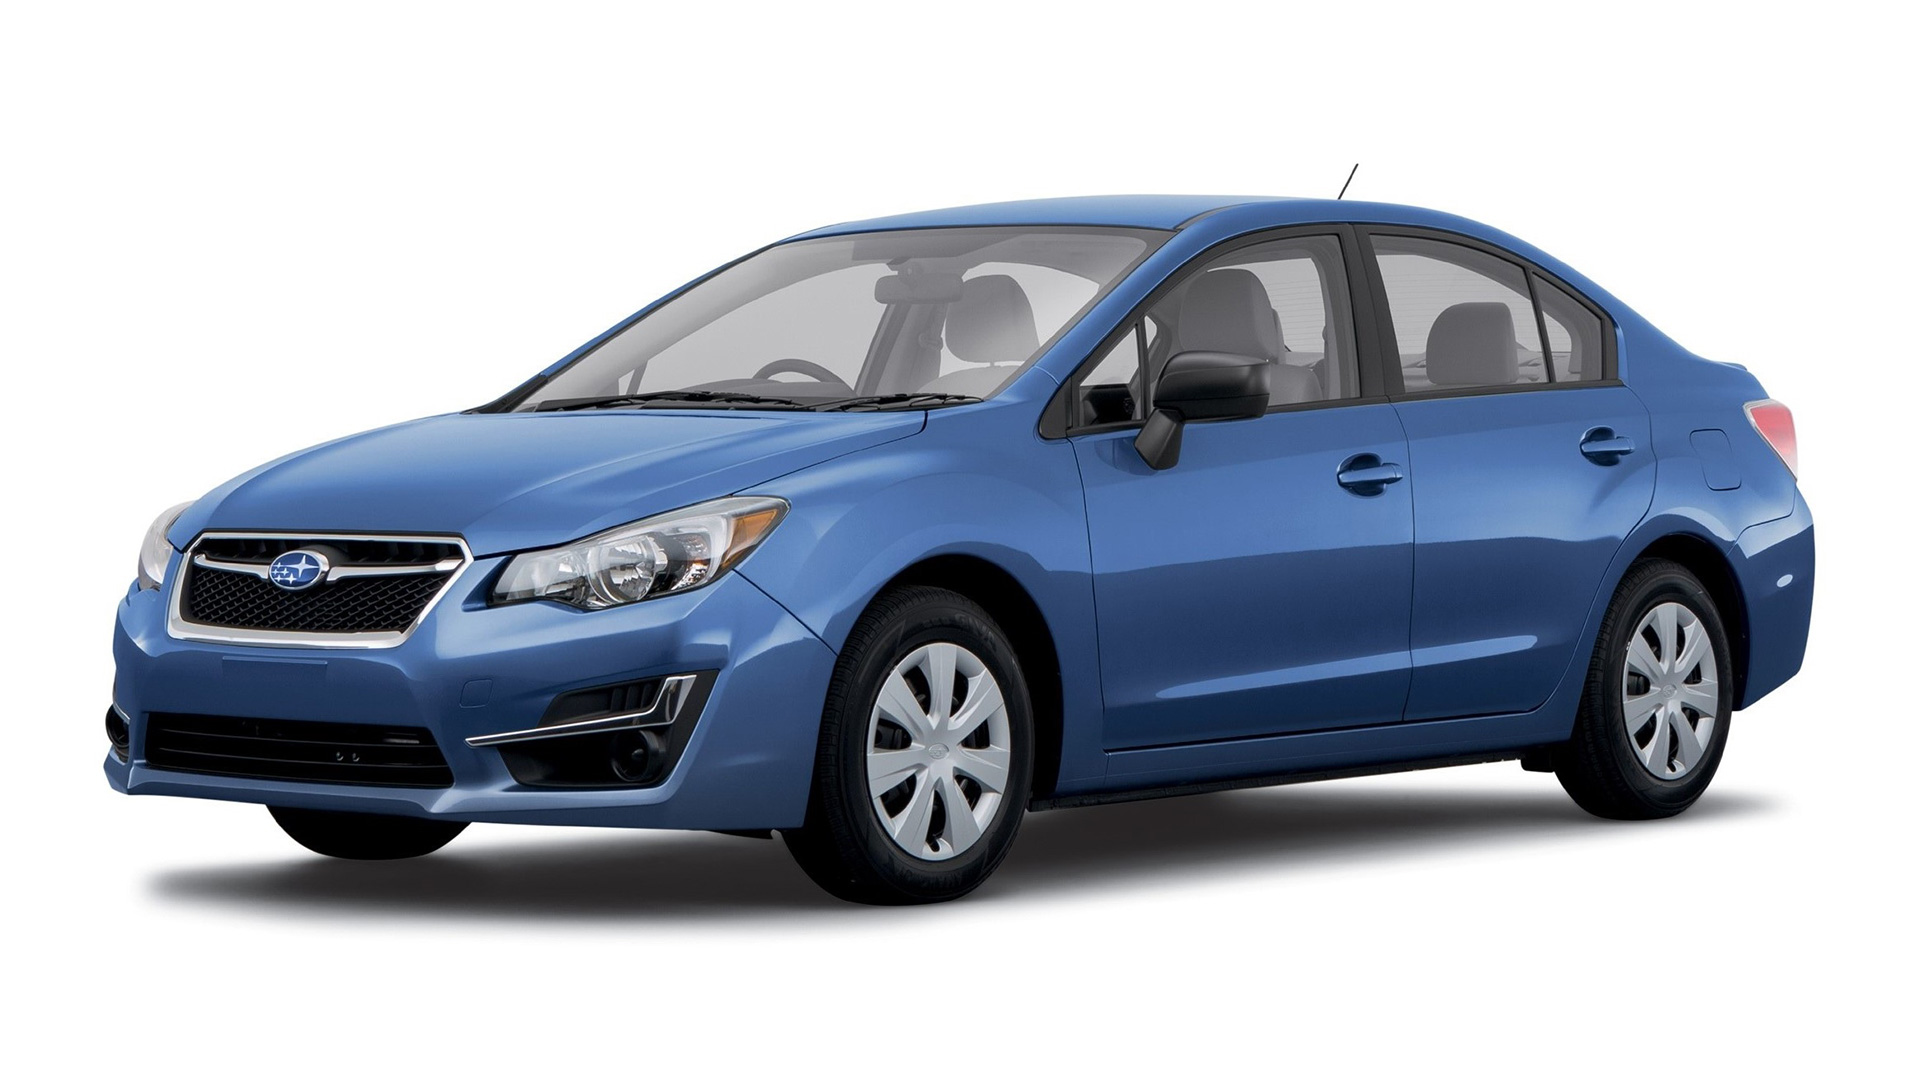 2016 Subaru Impreza 4 Door Sedan